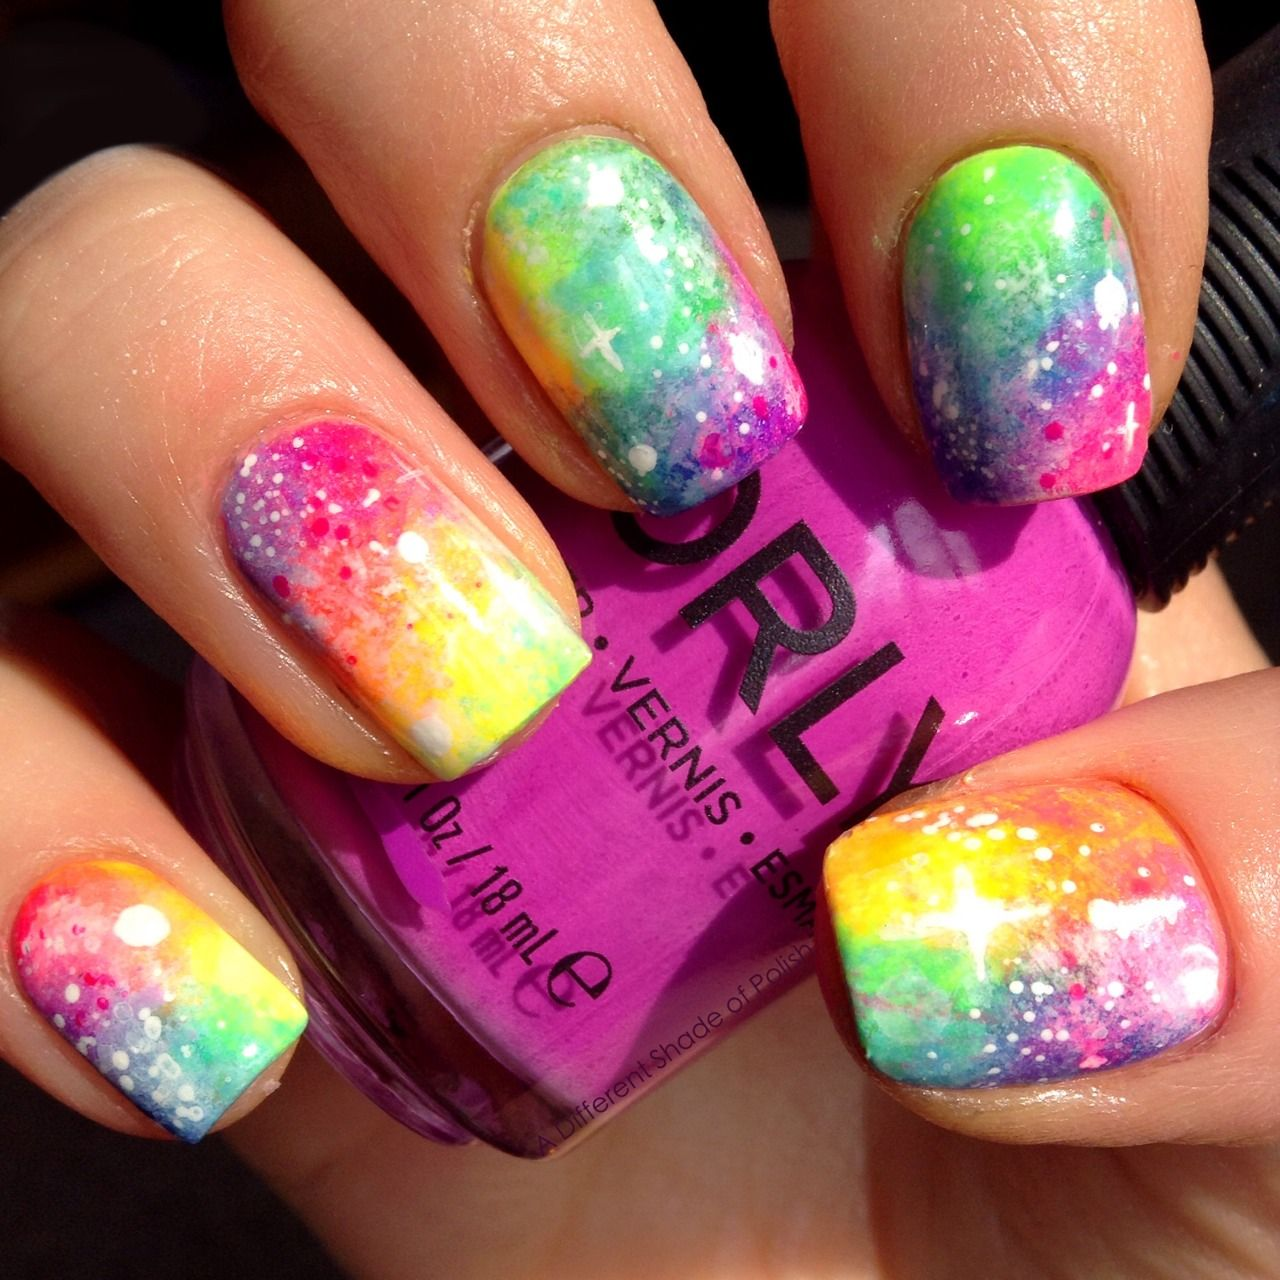 Neon Galaxy Nails by A Different Shade of Polish | Nails and Polish ...